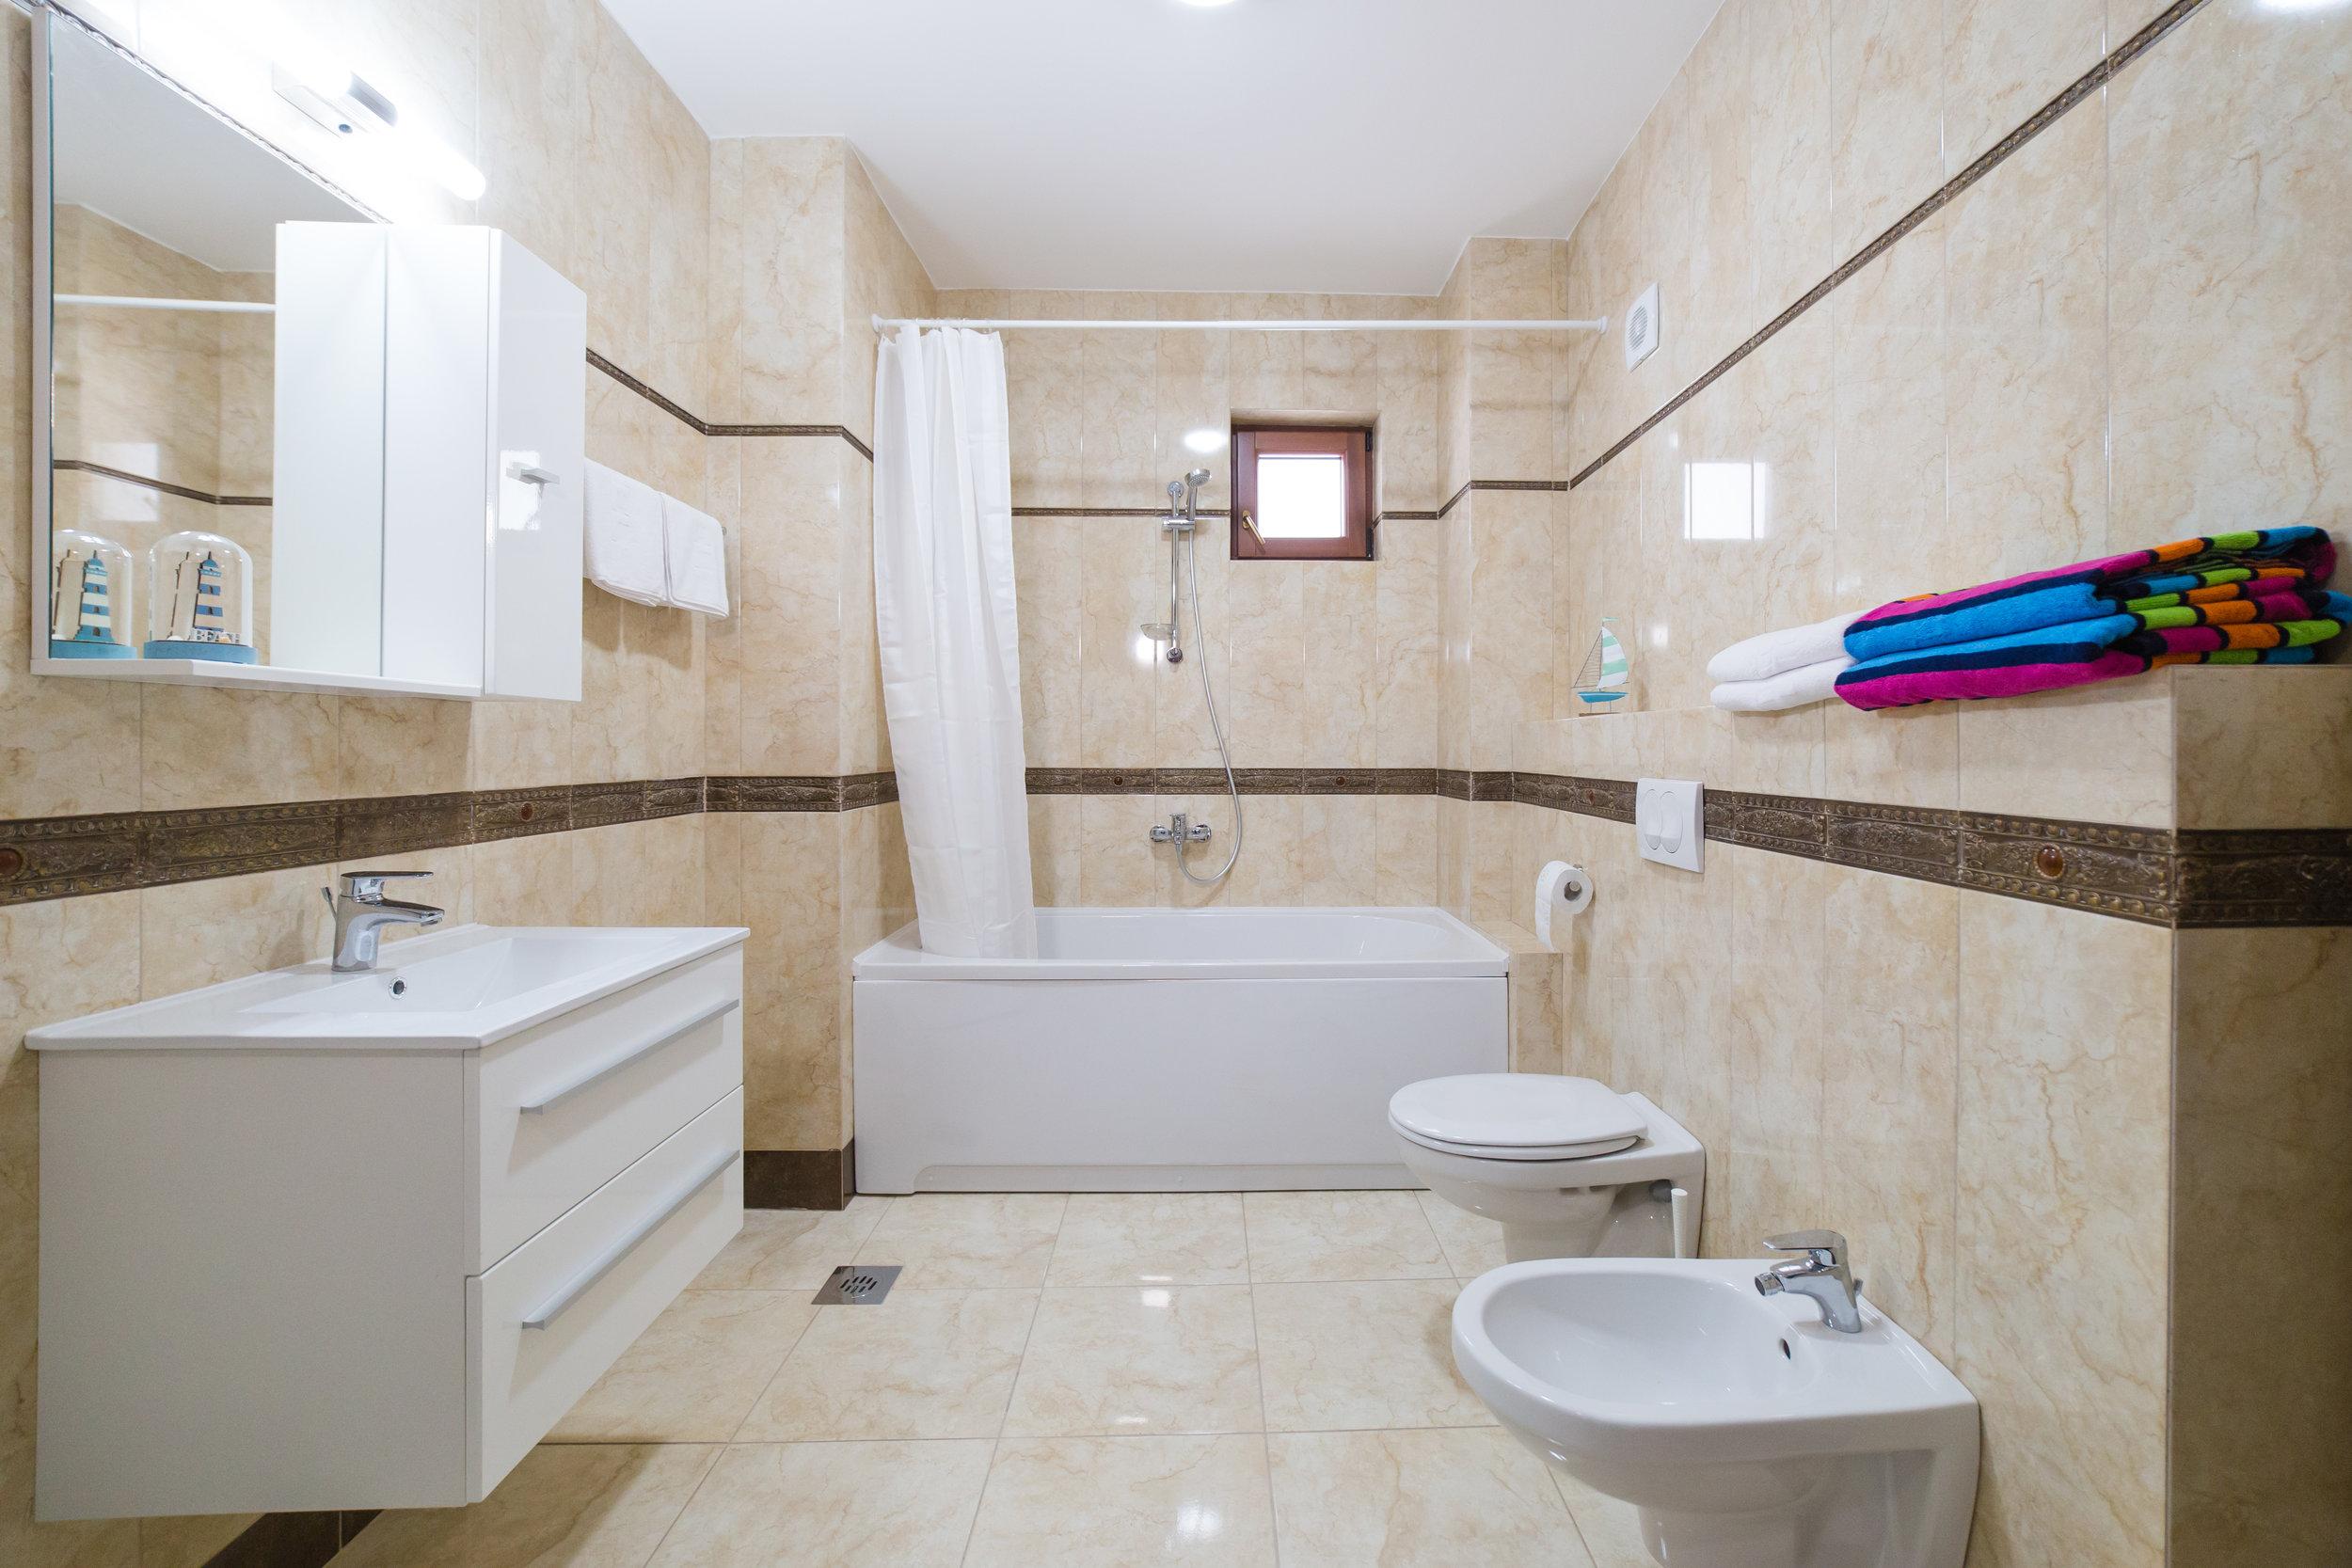 Aparthotel Апартотель | Anatolia |Becici Бечичи | Budva Будва | Montenegro Черногория | Apartments Апартаменты | Rents Аренда 18.jpg